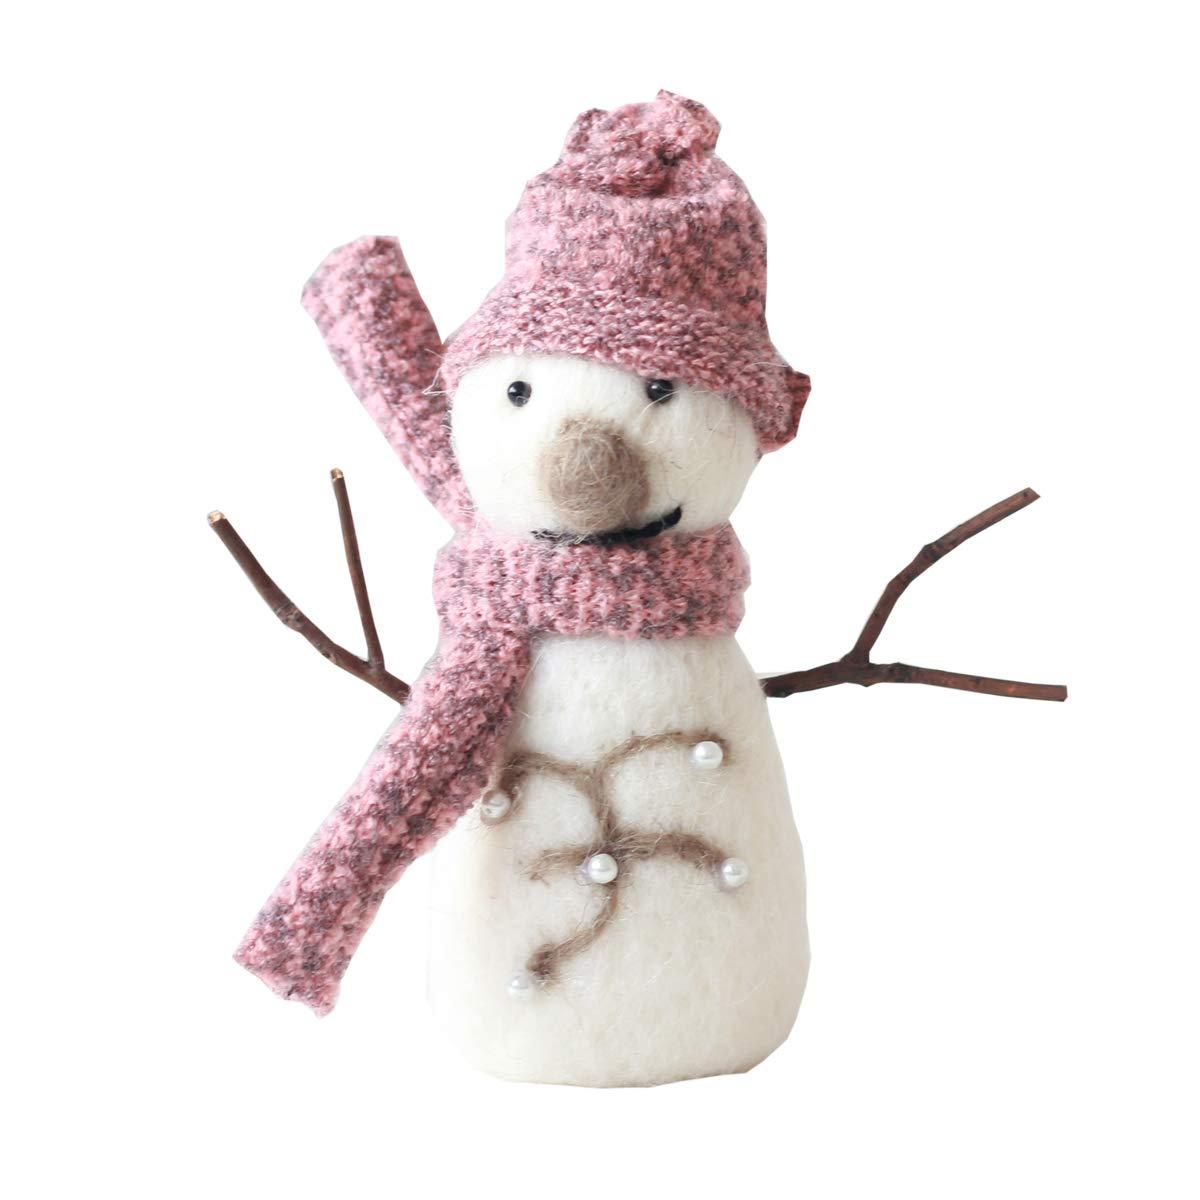 FREEDARE Christmas Decorations Wool Felt for Home Decor, Christmas Tree Decoration (Pink Snowman